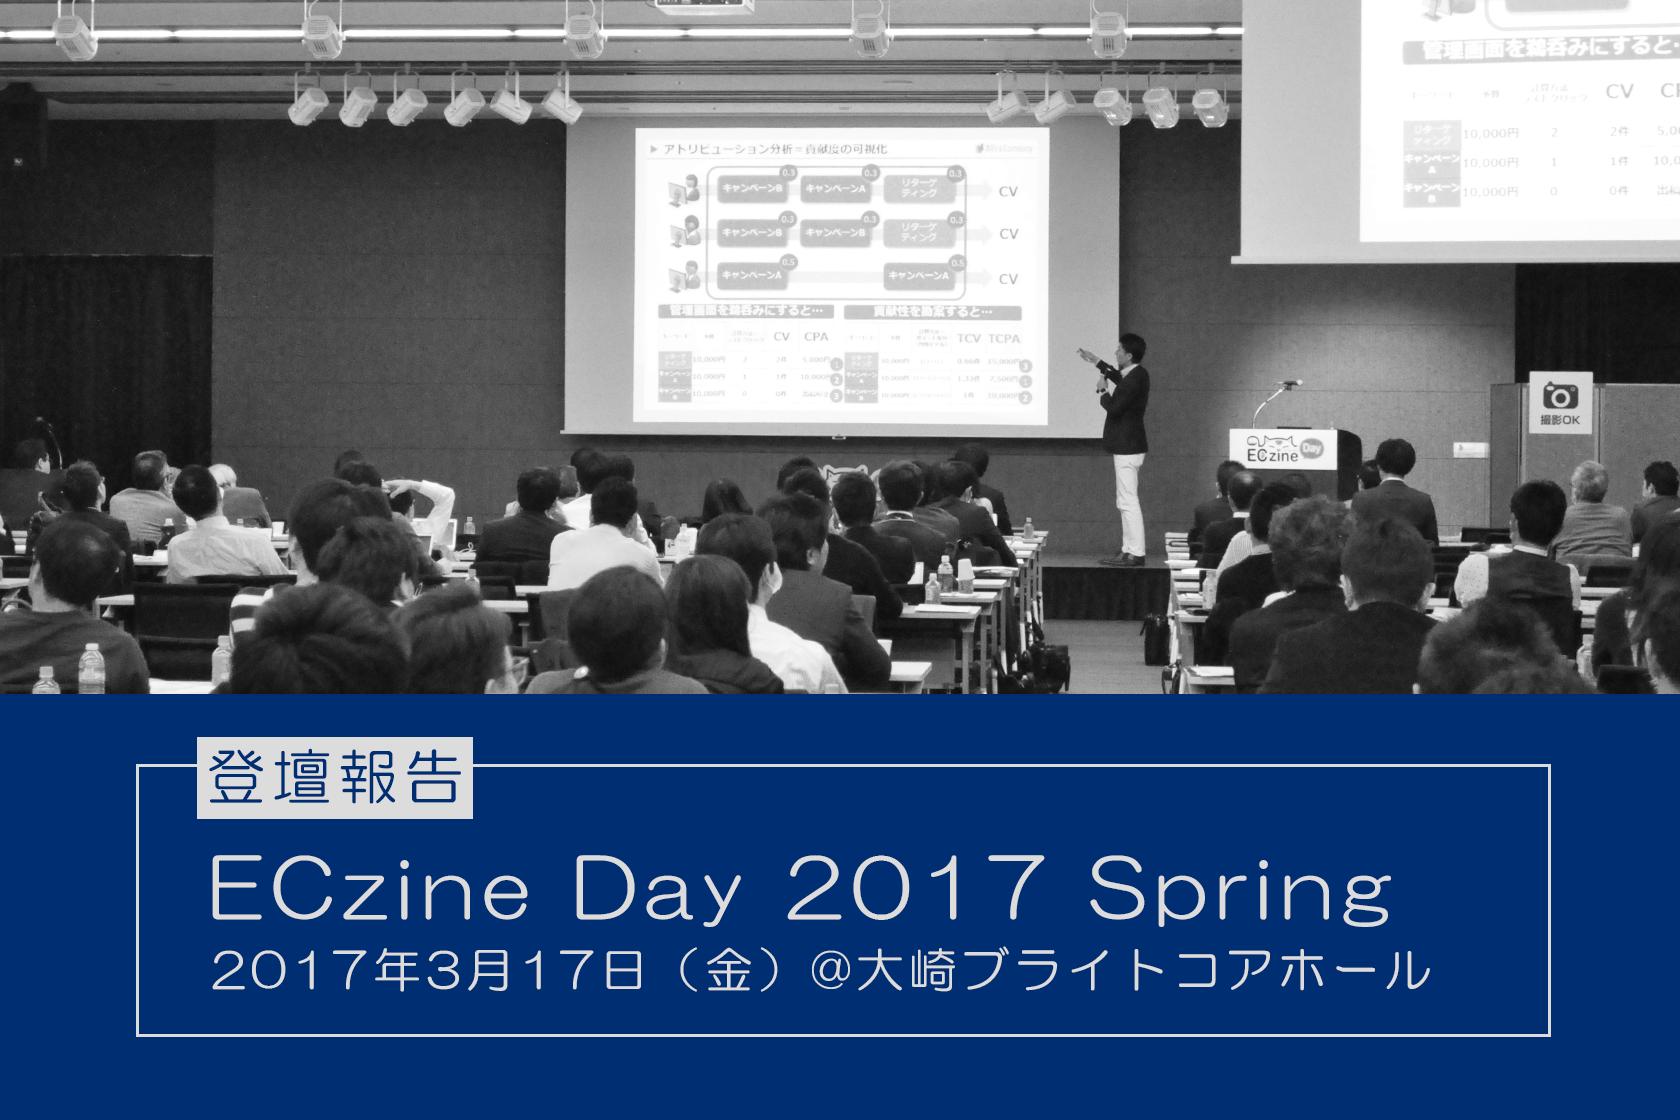 『ECzine Day 2017 Spring』に登壇しました